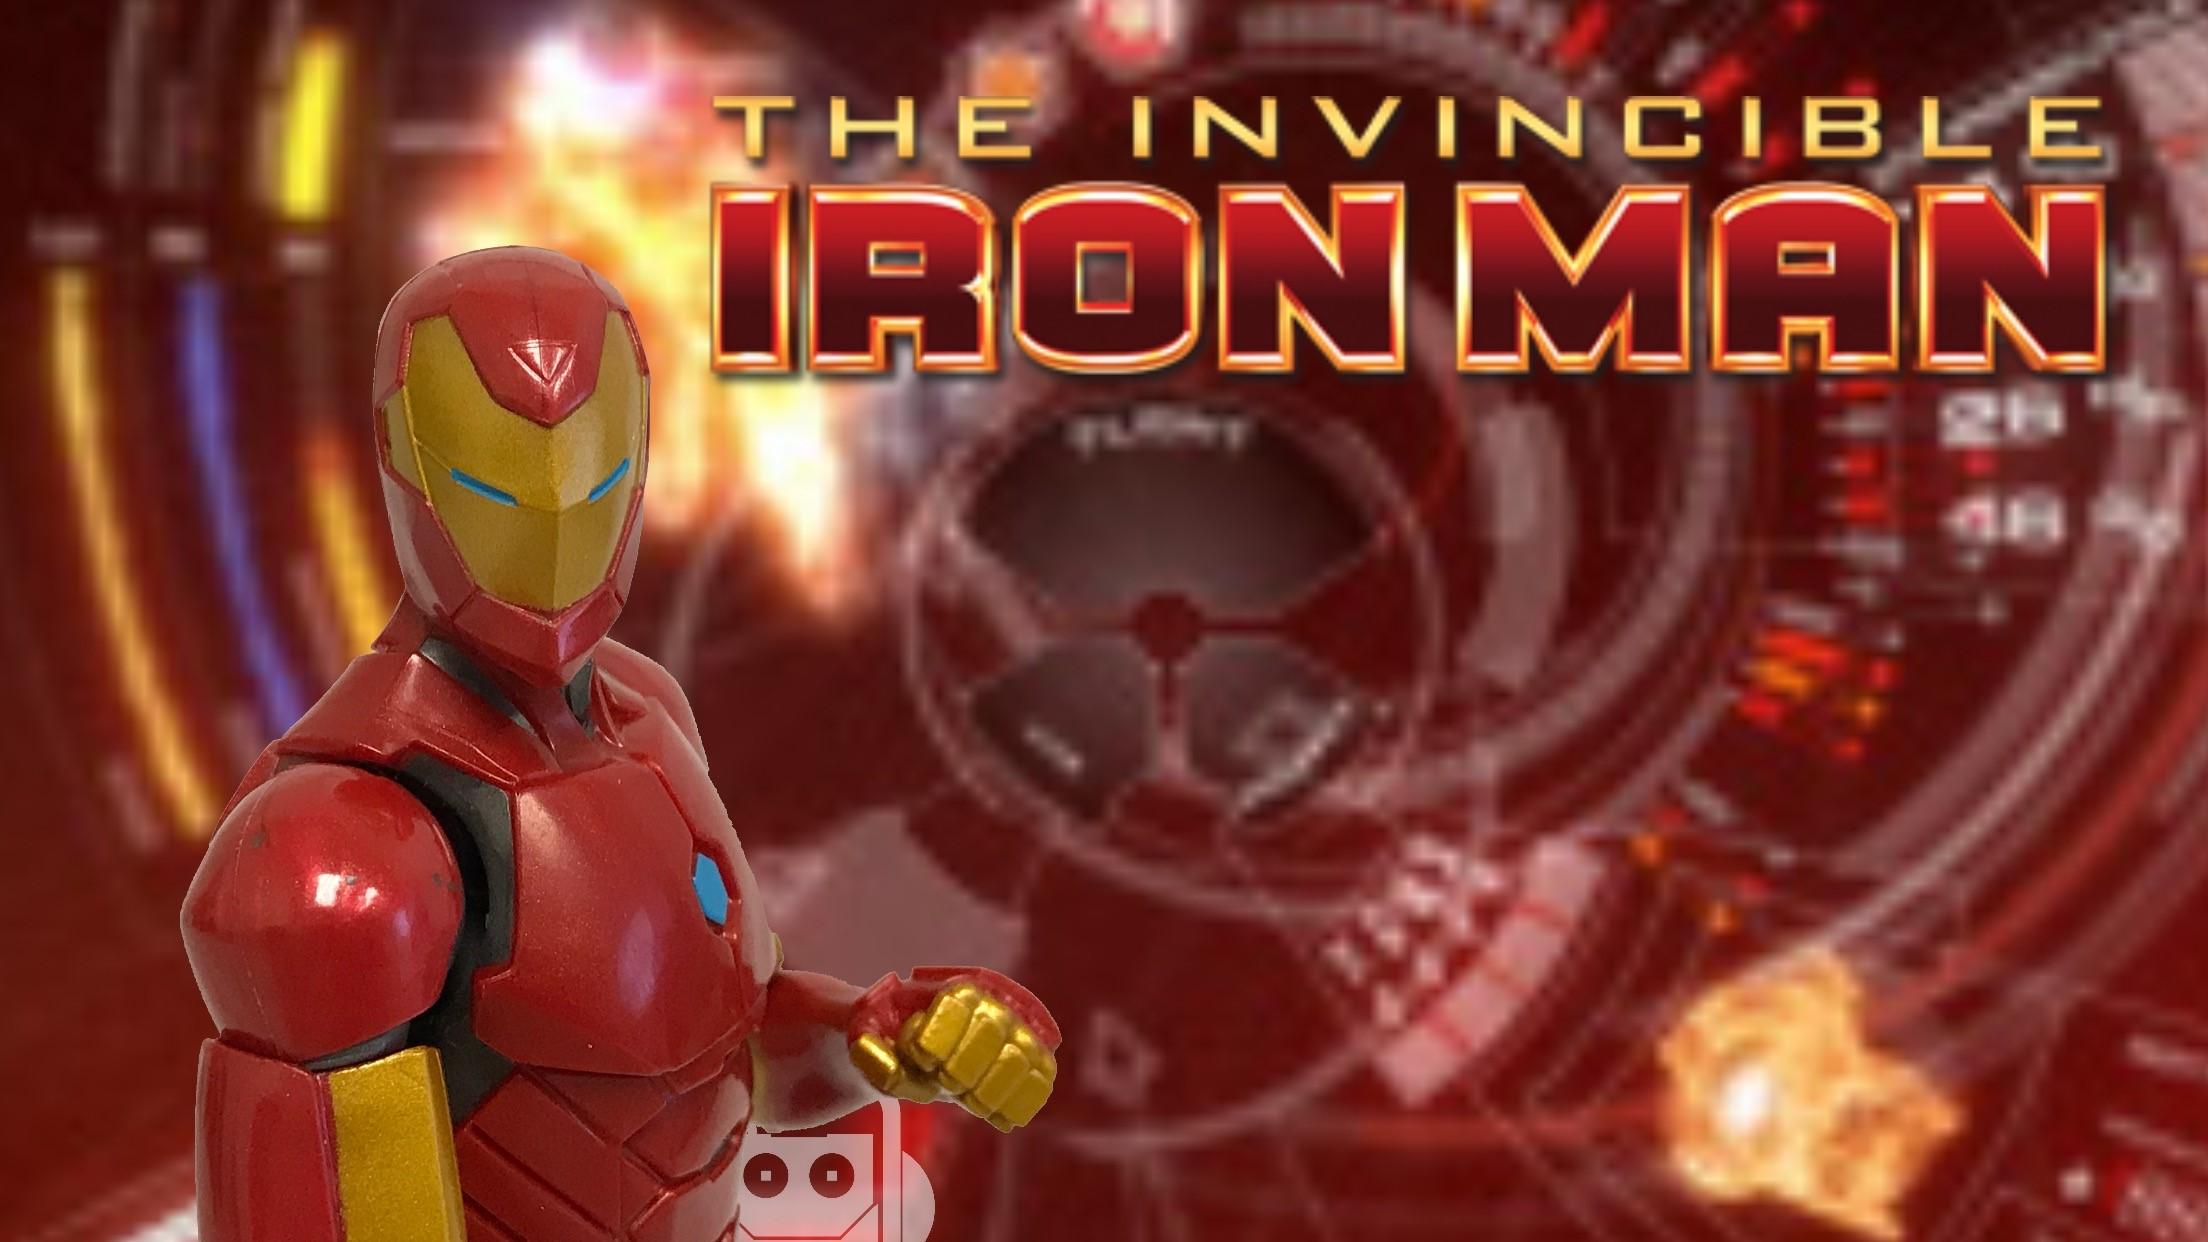 Iron Man Header.jpg